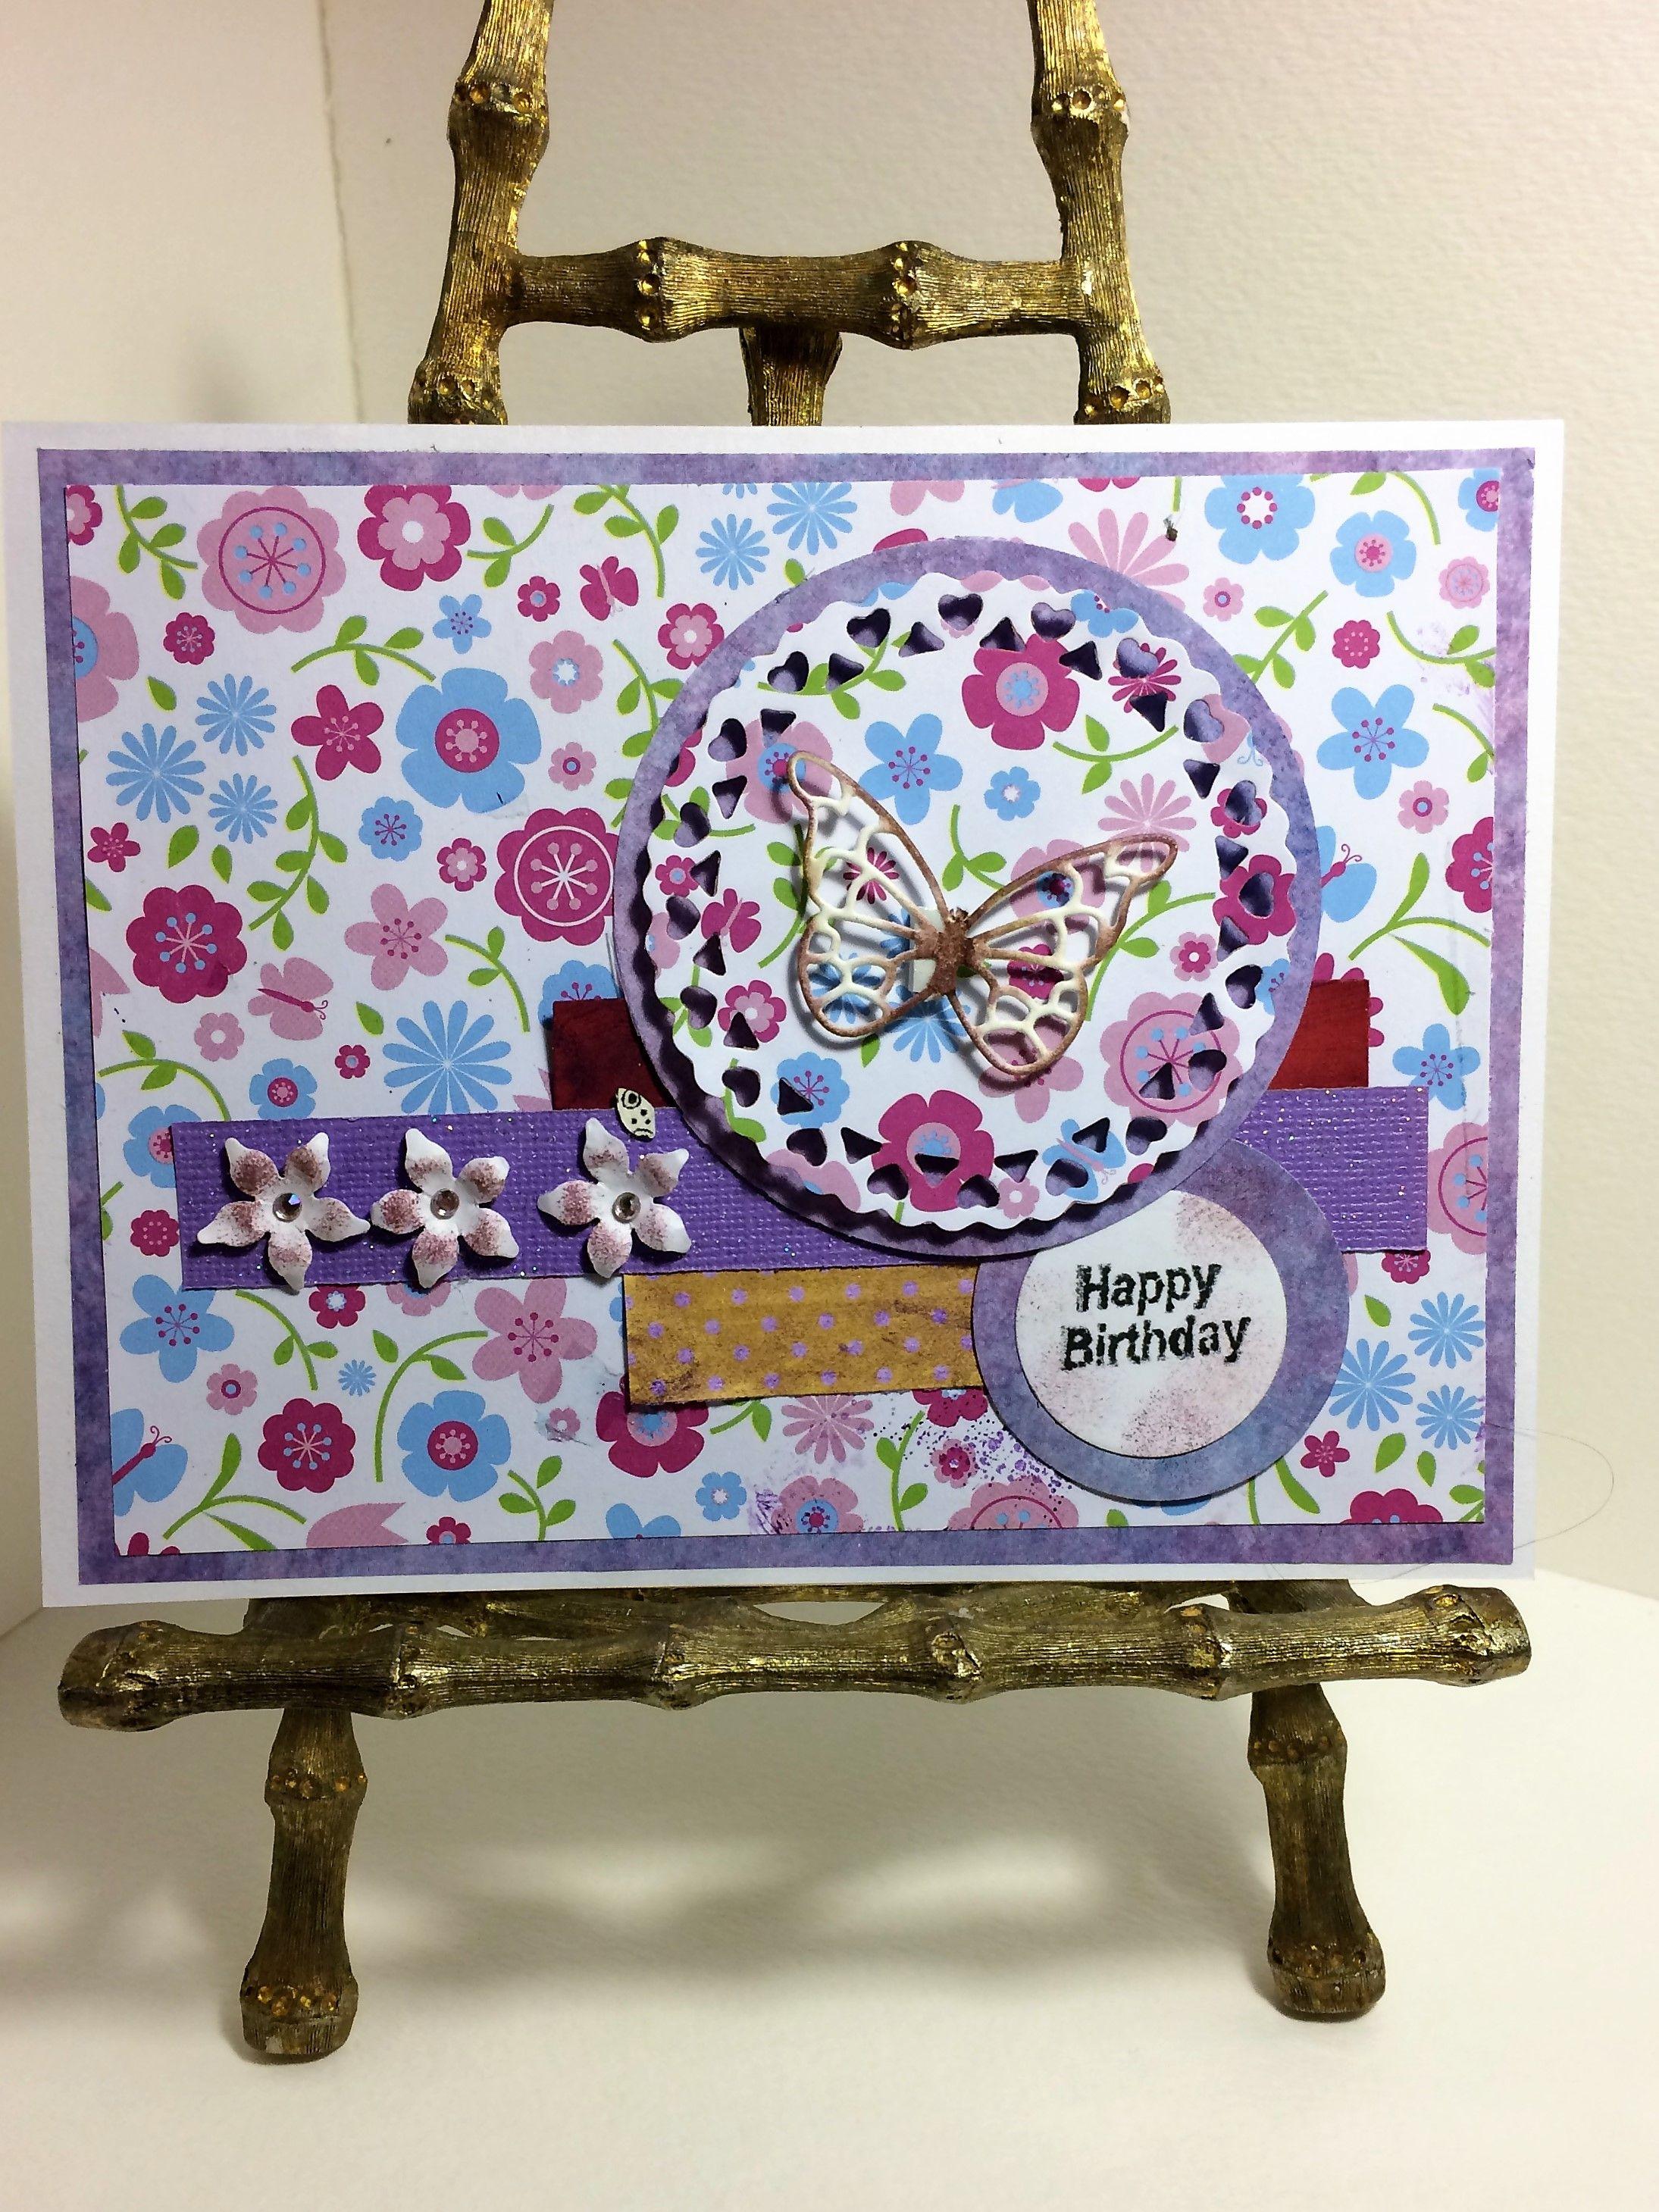 Pin by kay henslee on kayus handmade greeting cards pinterest